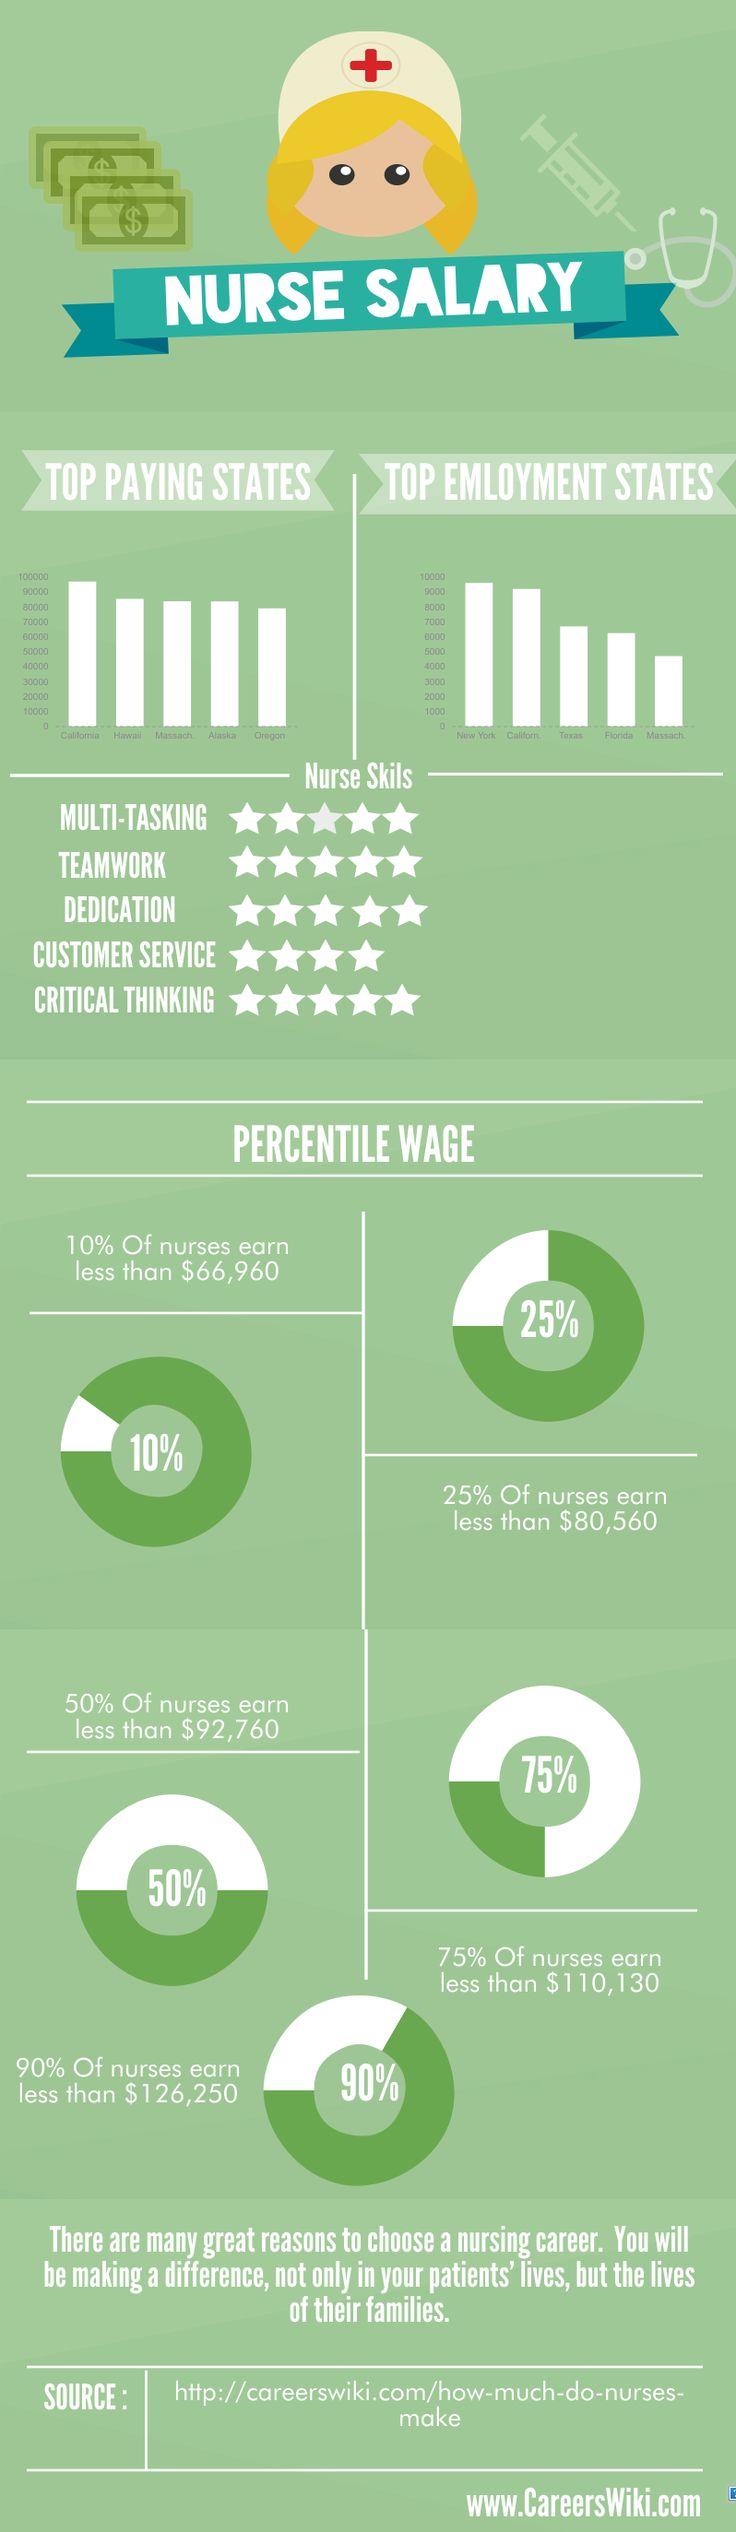 How much do Nurses make? INFOGRAPHIC Nursing infographic